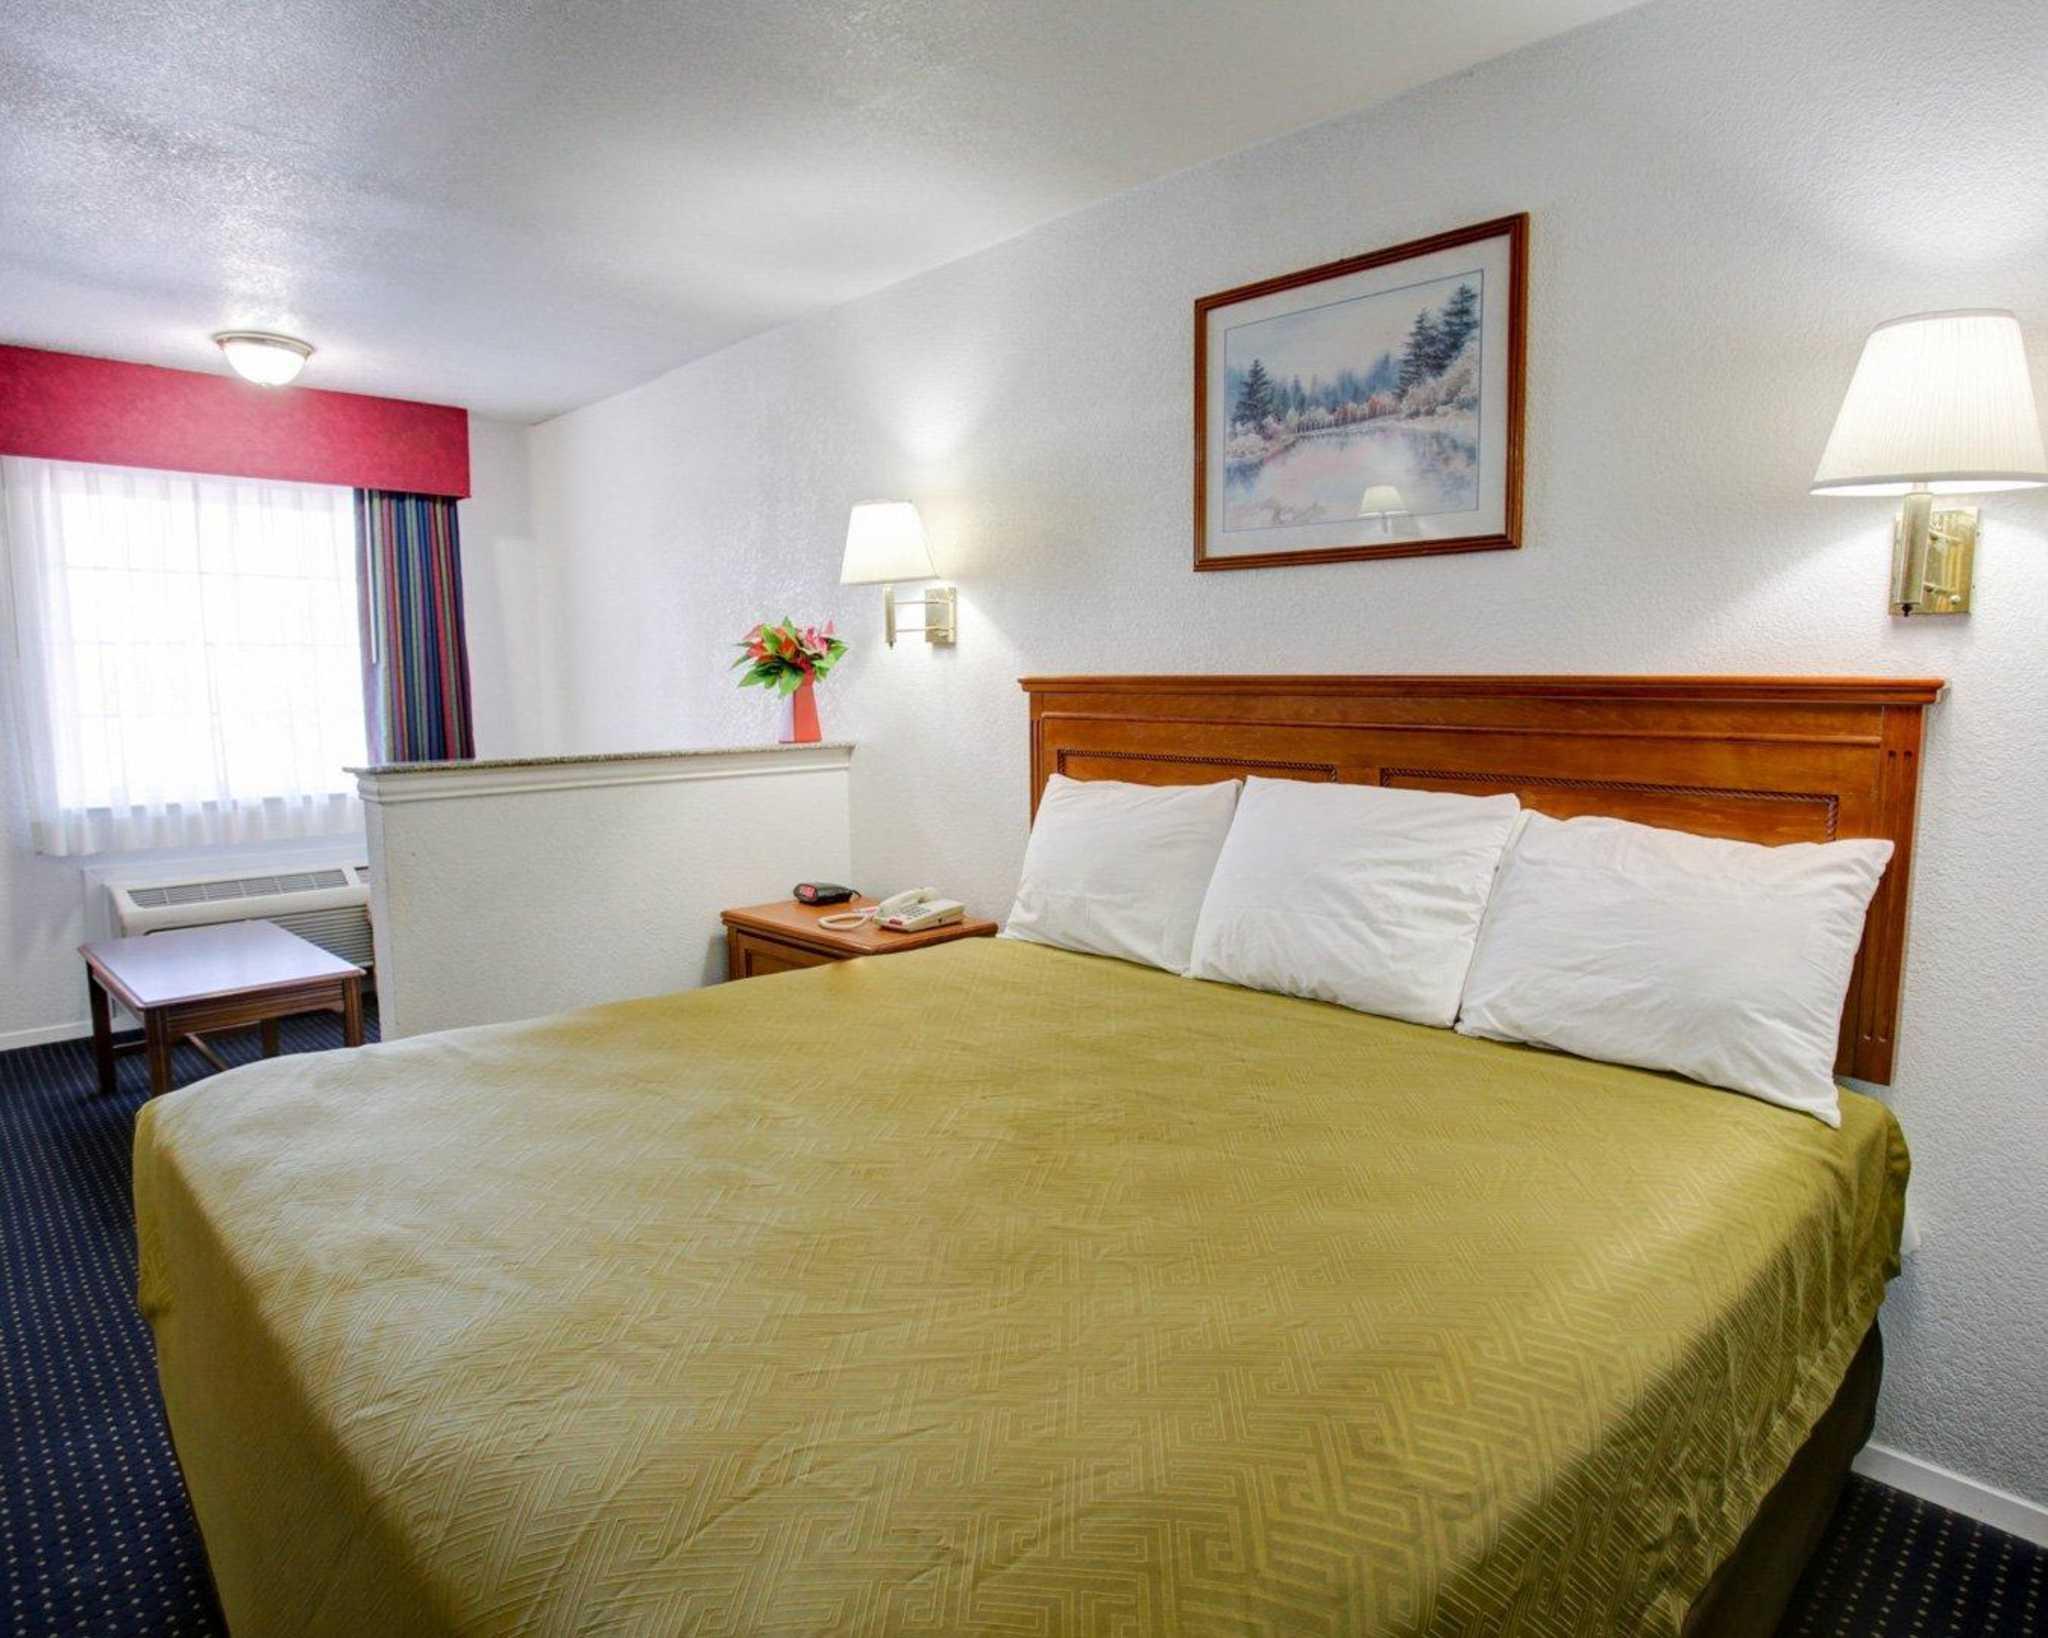 Pet Friendly Hotel Rooms In Killeen Texas